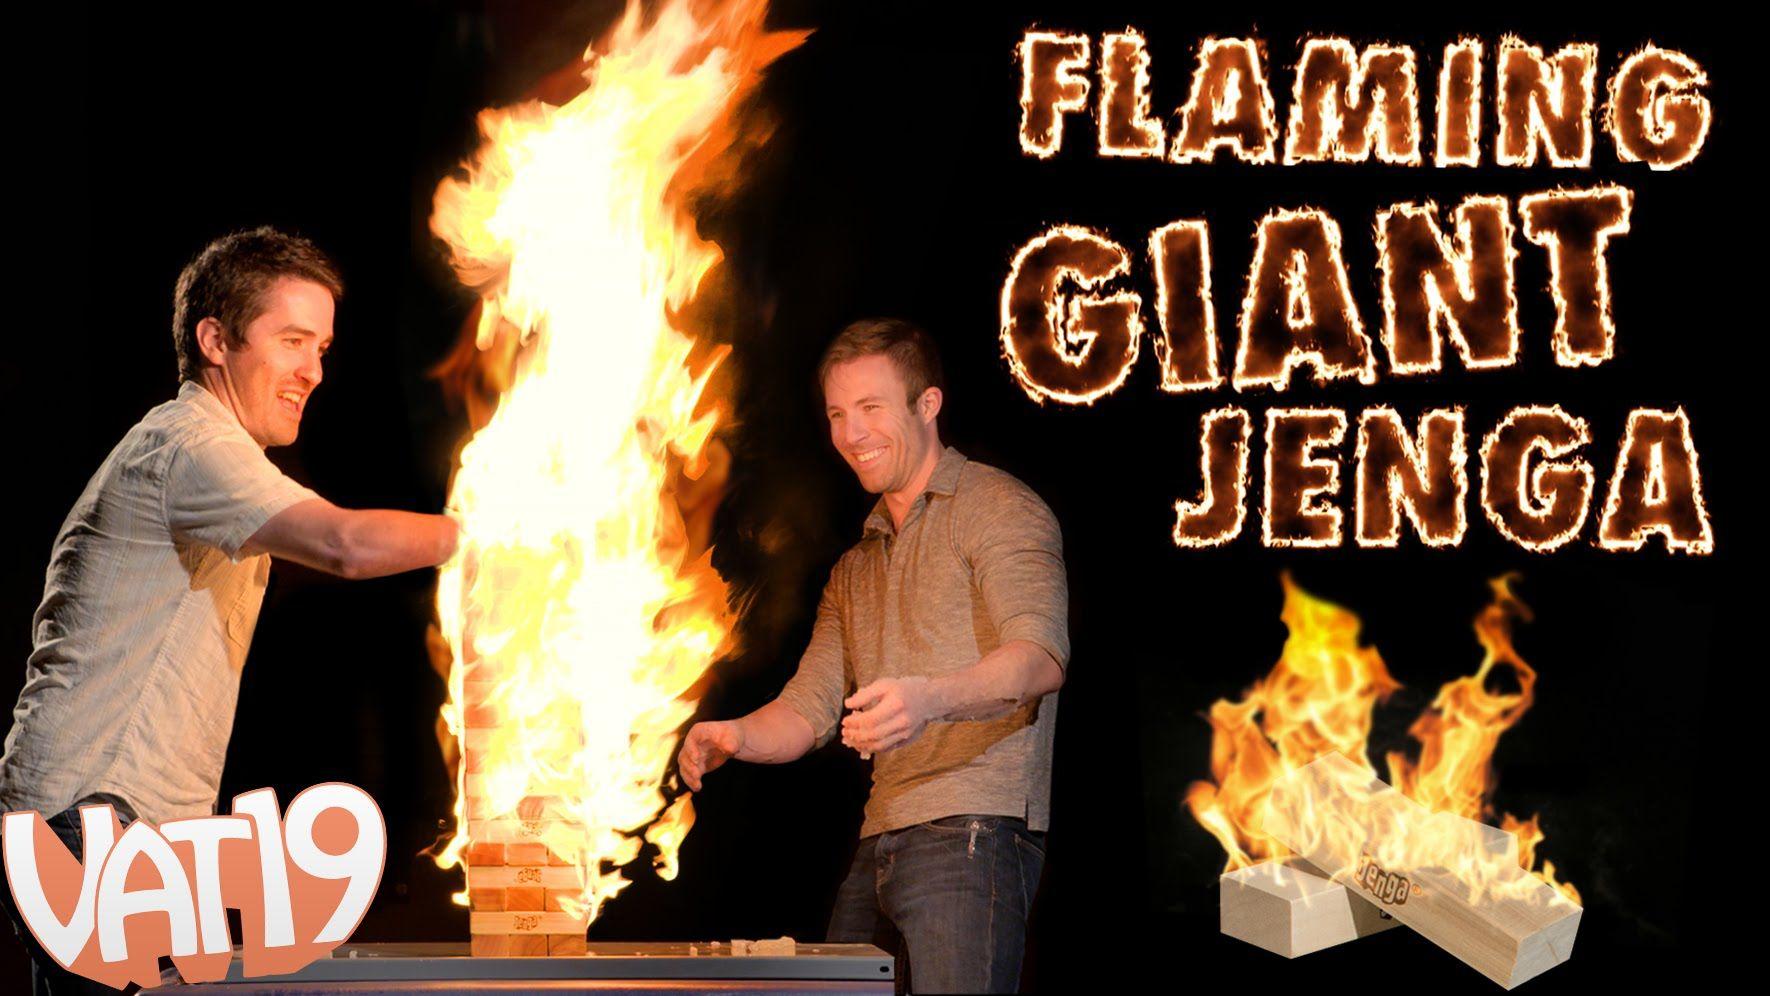 Playing a Giant Game of Flaming Jenga Giant jenga, Fire